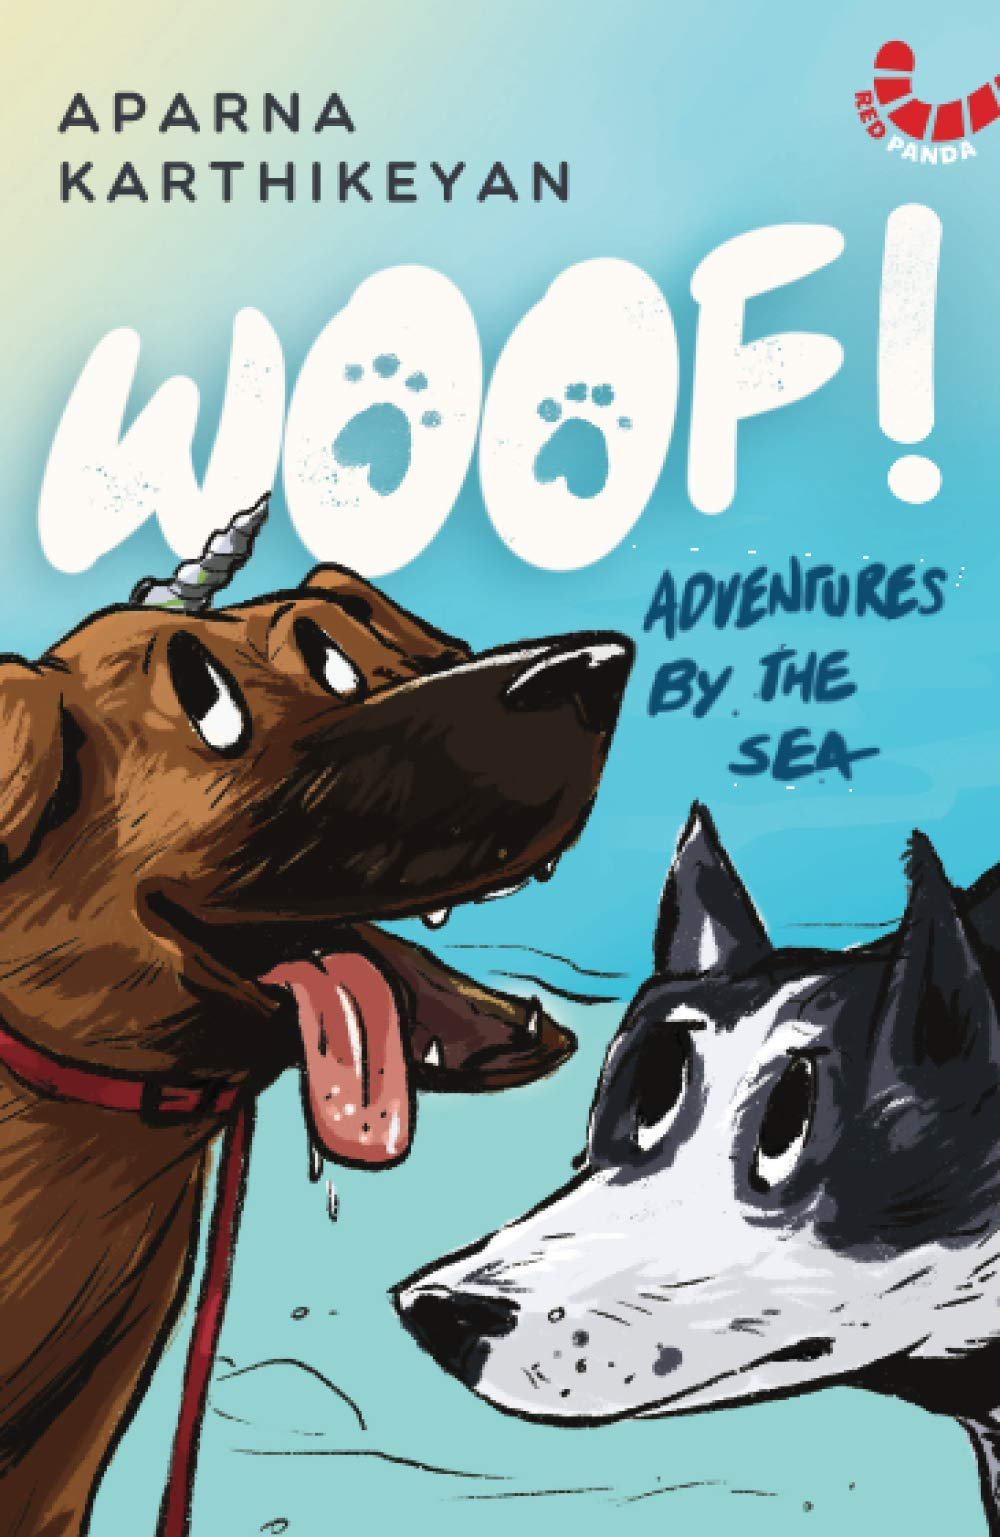 WOOF! ADVENTURES BY THE SEA APARNA KARTHIKEYAN